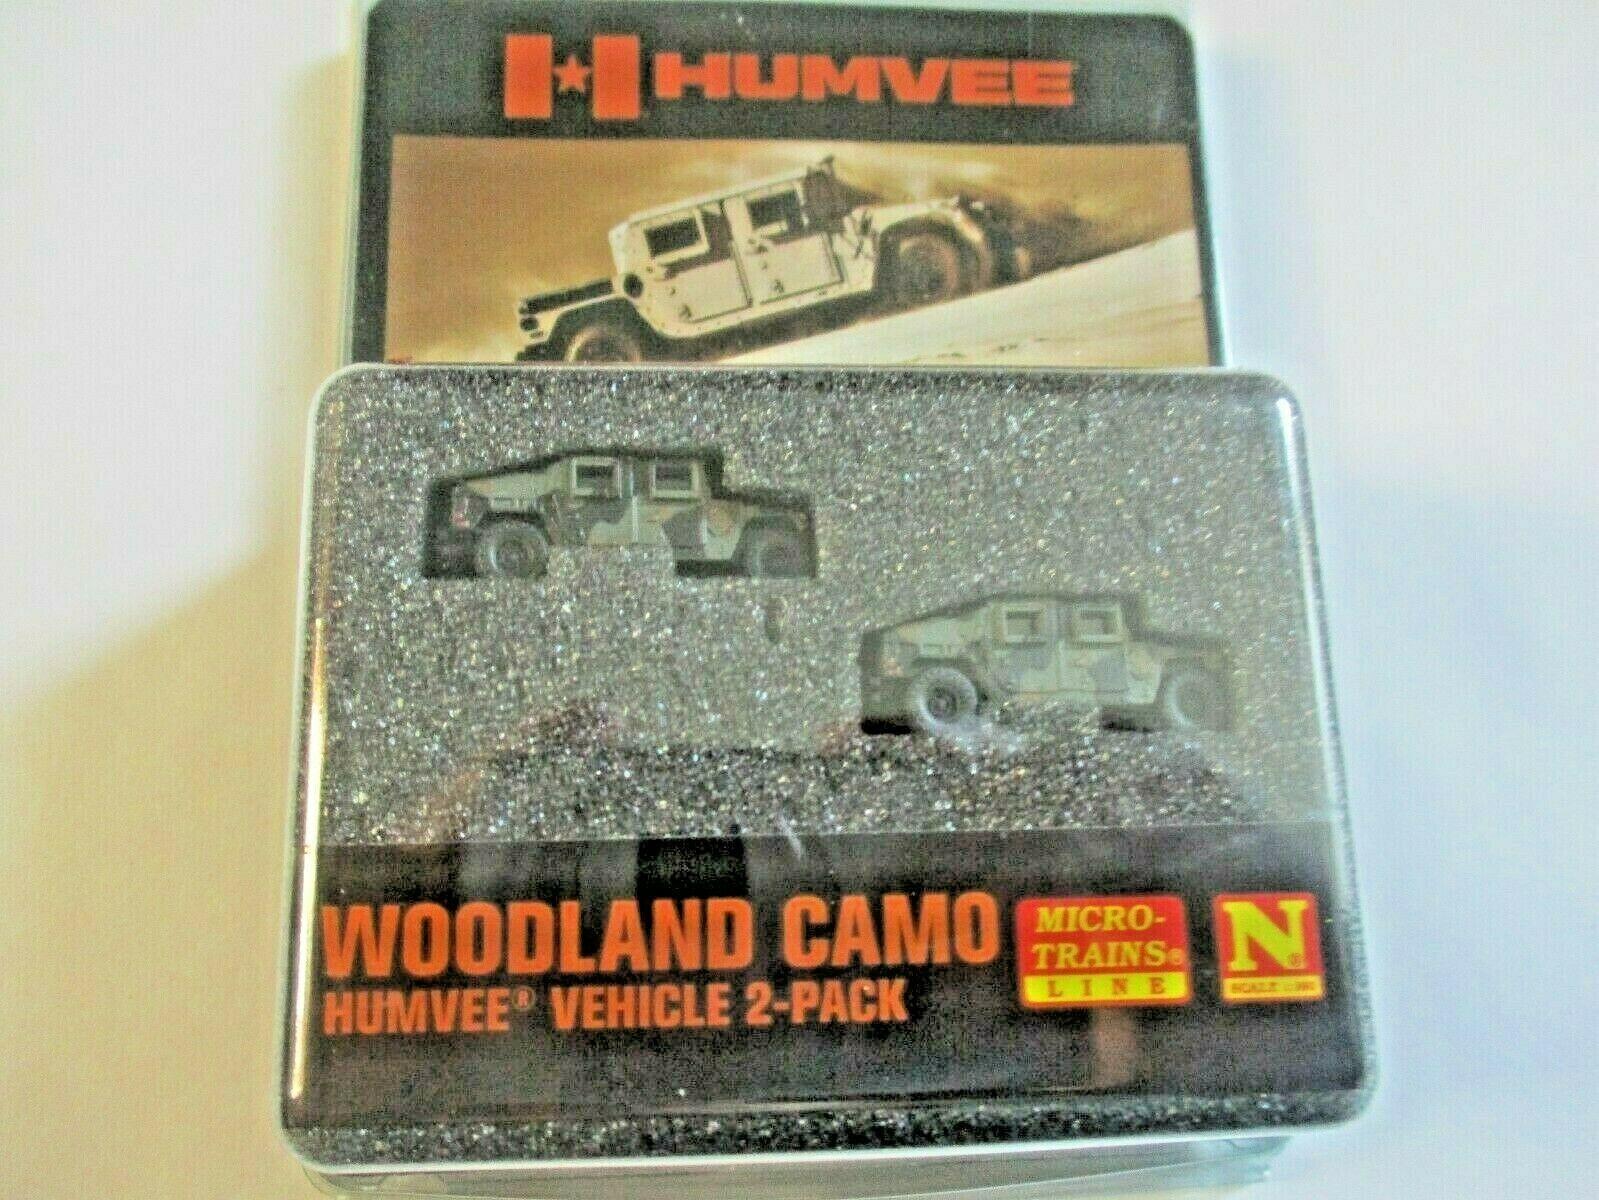 Micro-Trains # 49945954 Desert Camo Humvee Vehicle 2 Pack N-Scale